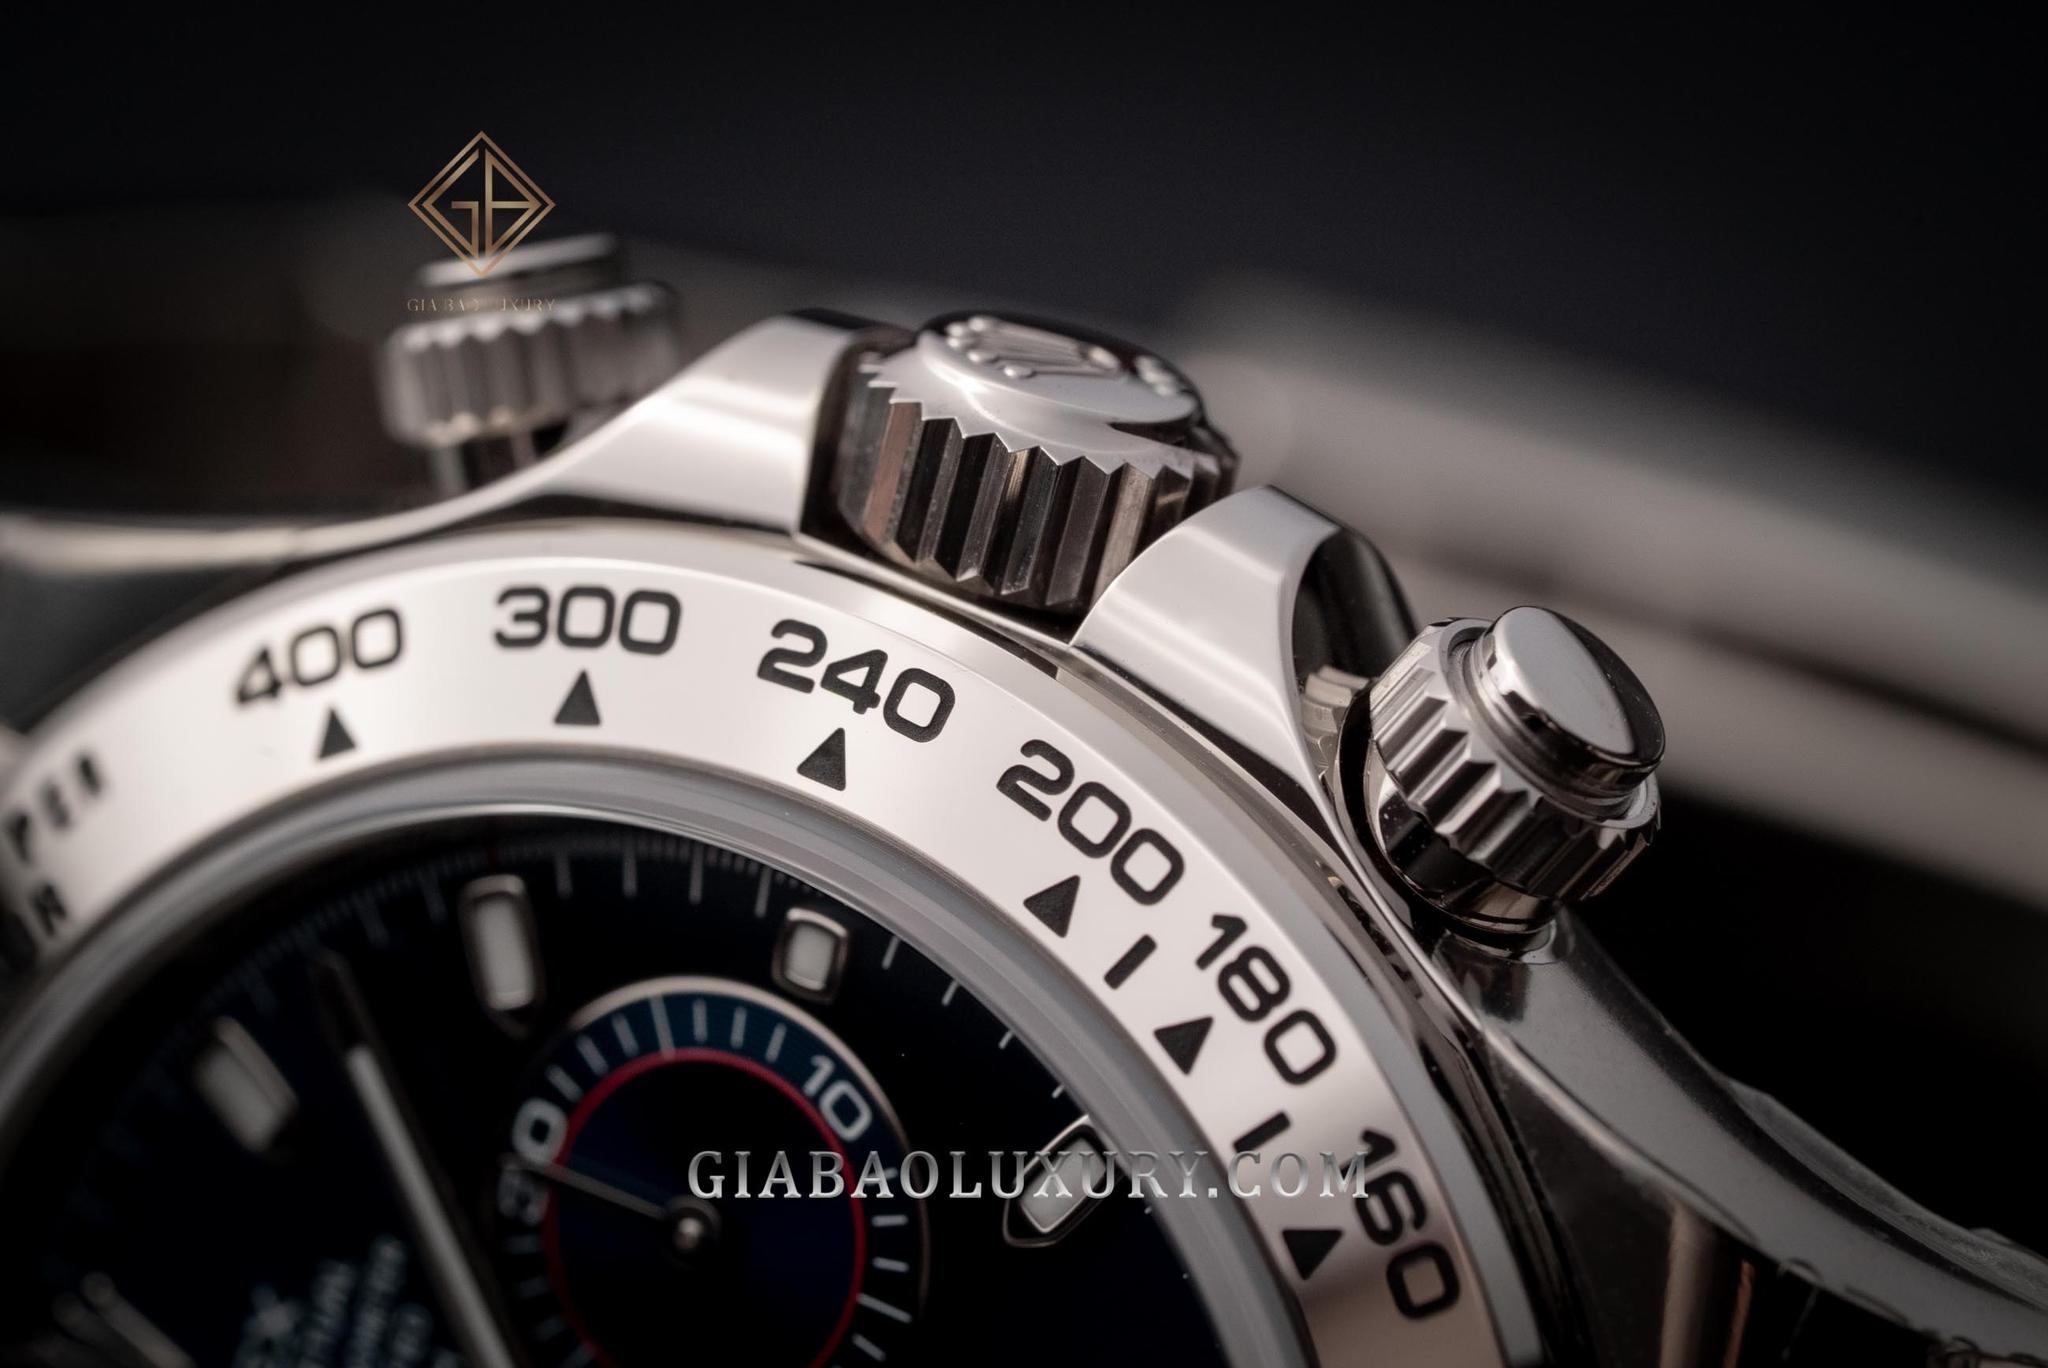 Đồng hồ Rolex Cosmograph Daytona 116509 Mặt Số Xanh